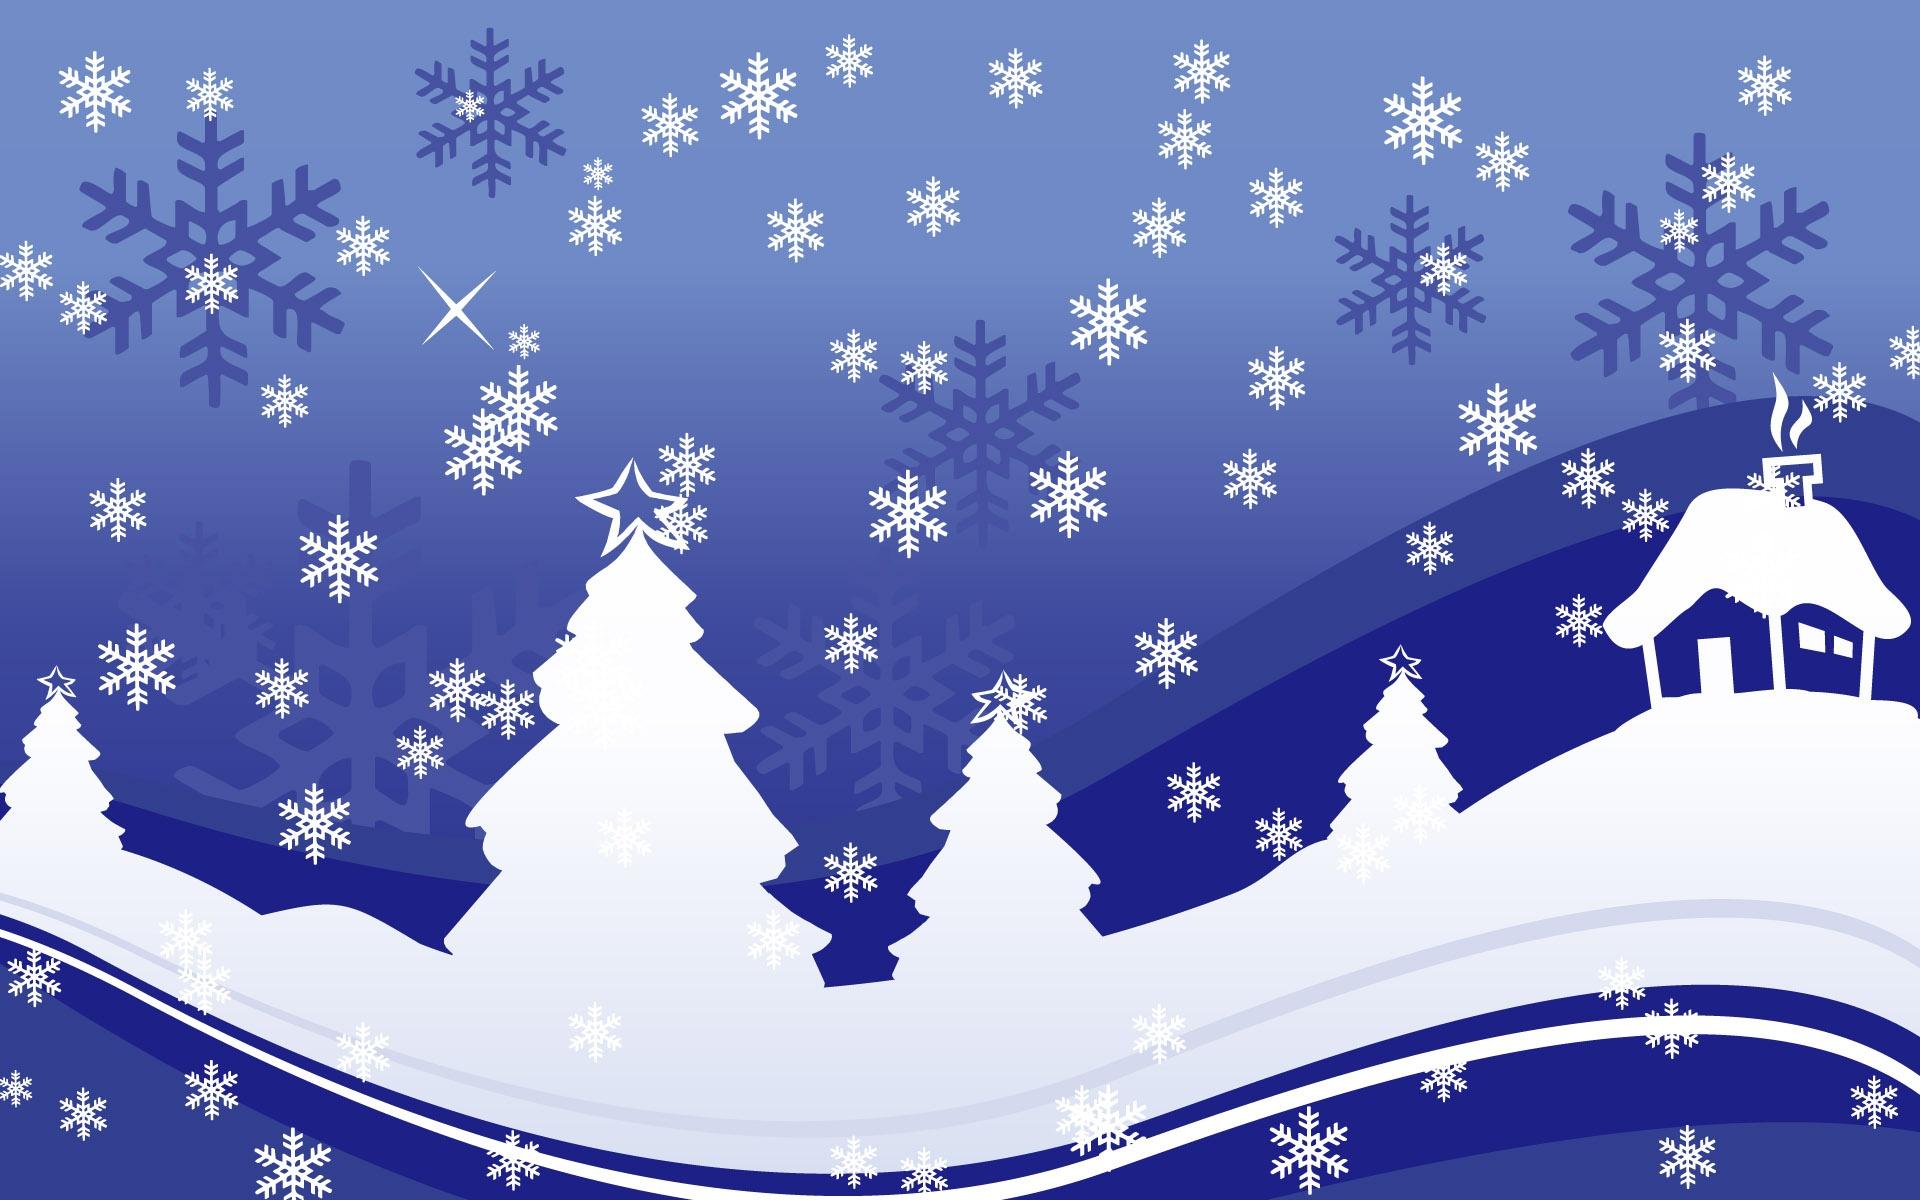 Fond d'ecran Flocons neige maison Noel - Wallpaper